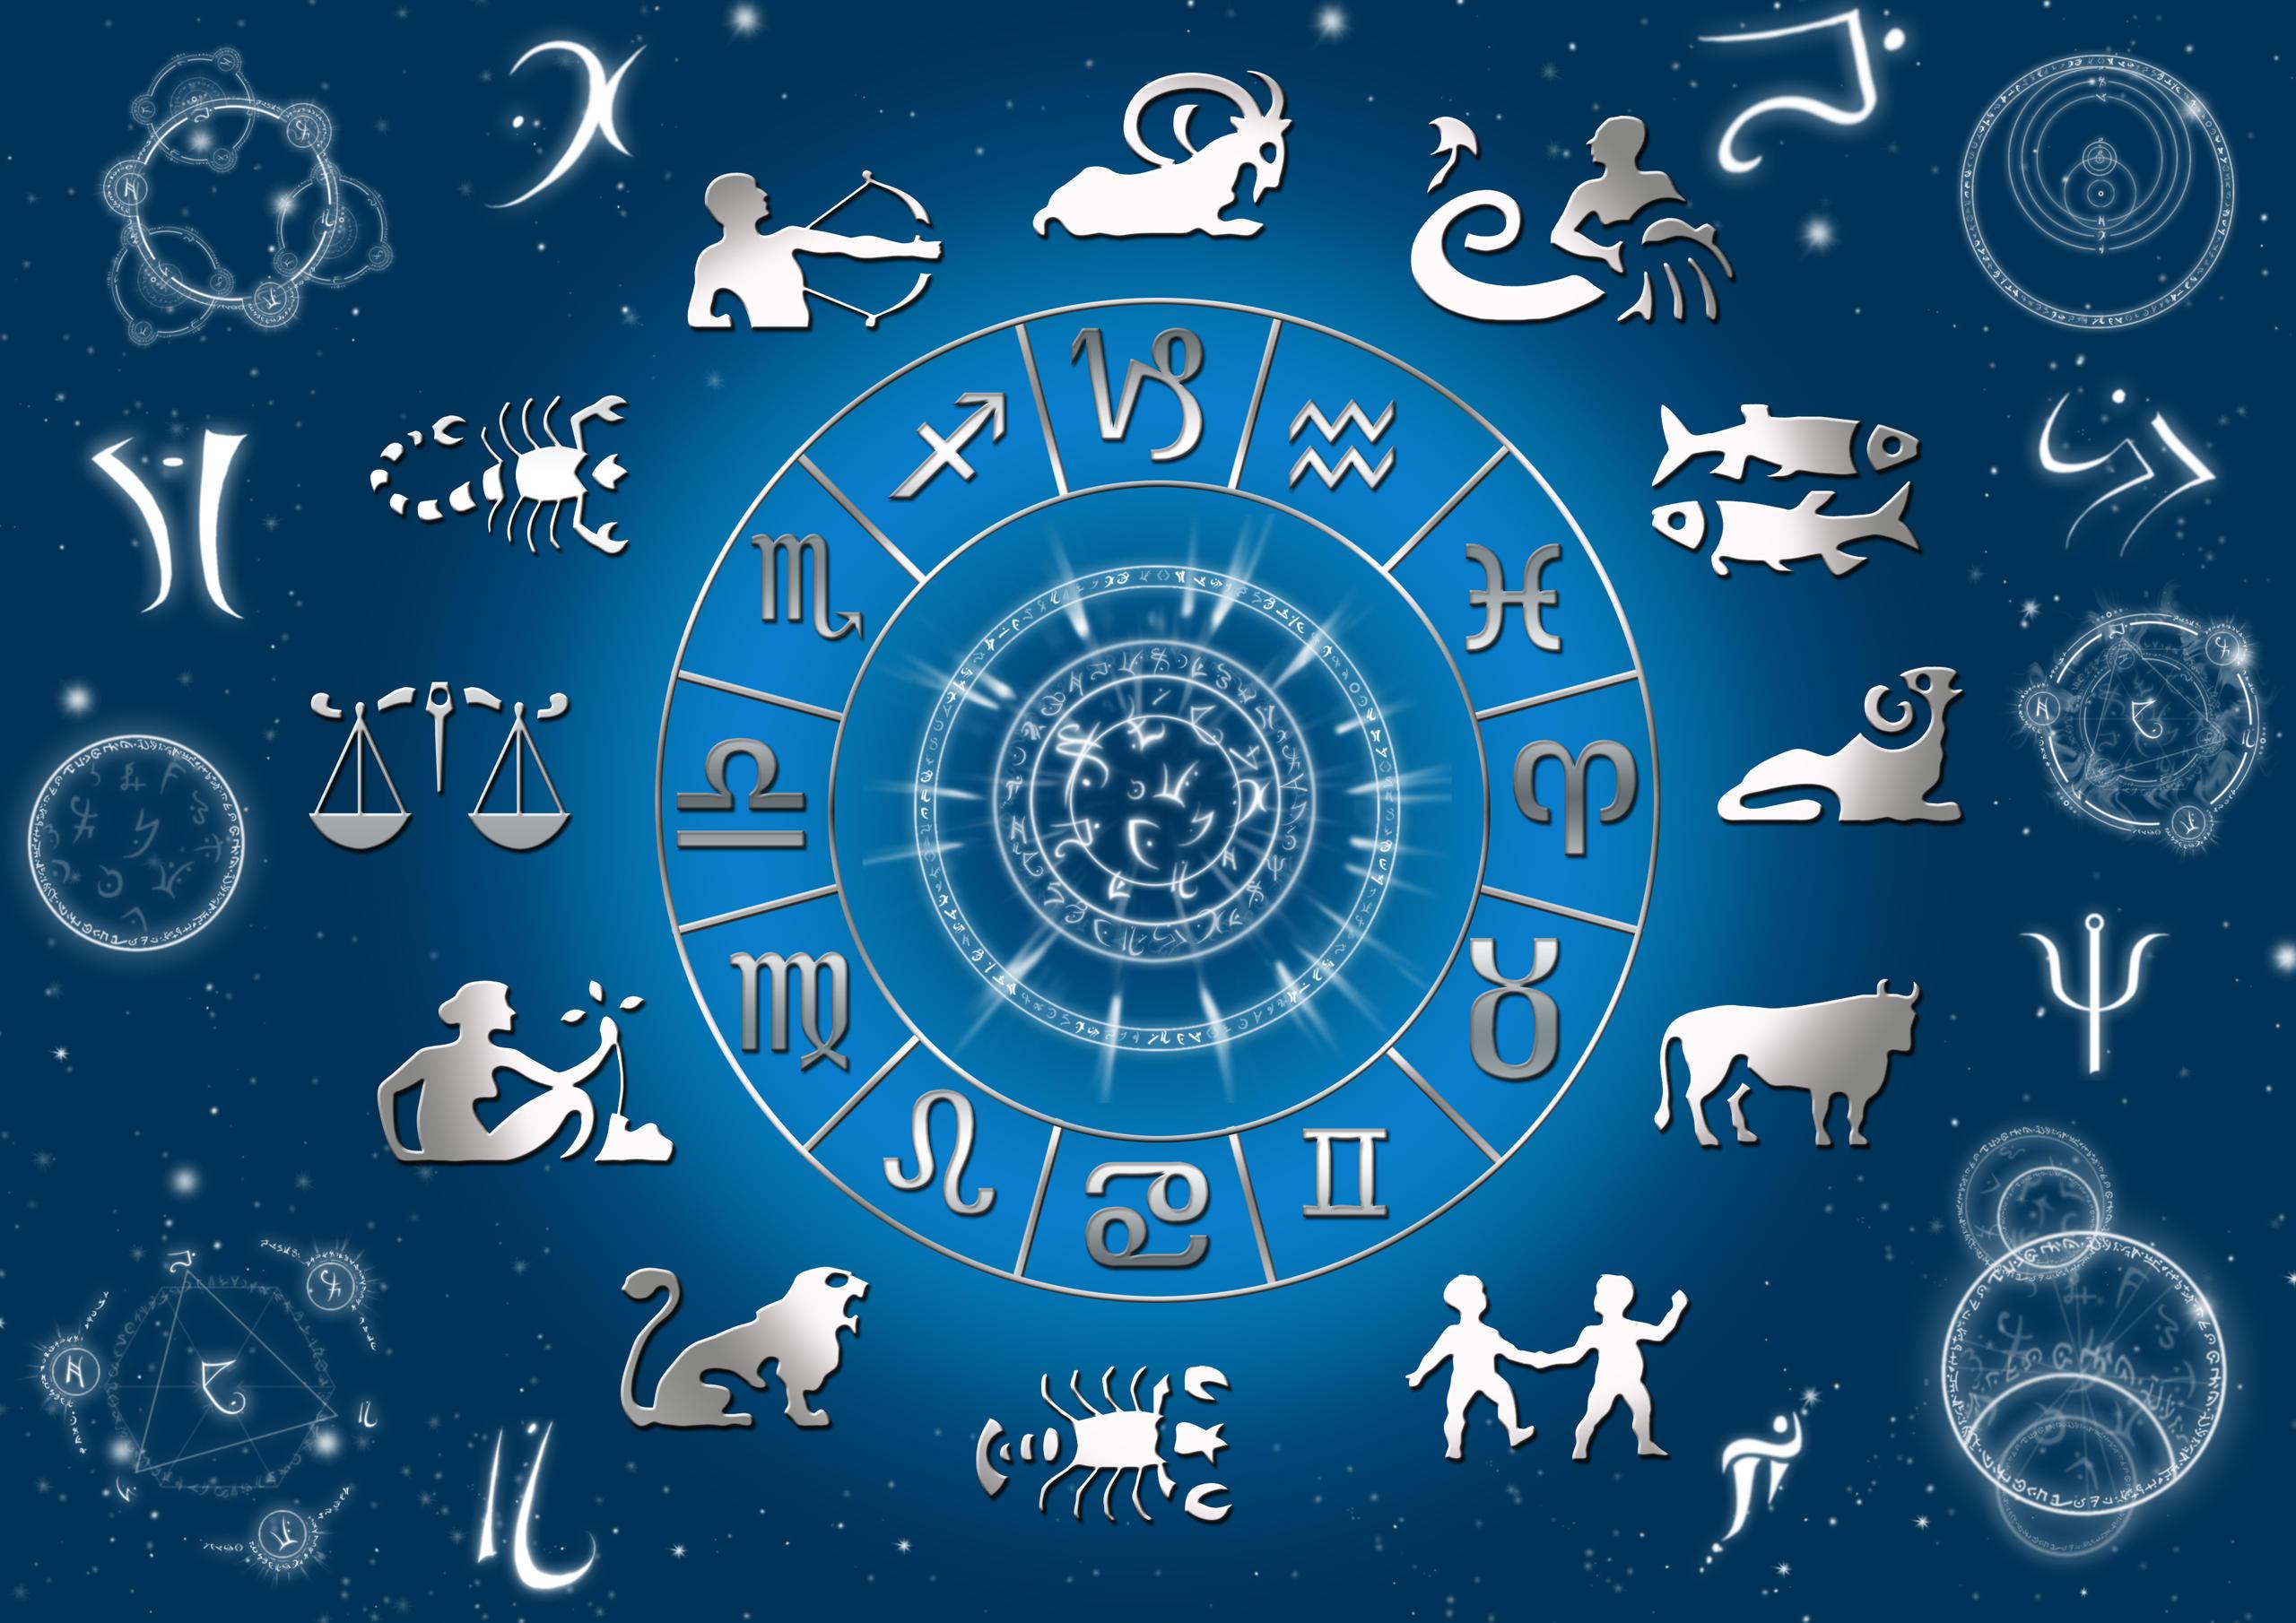 12 ascendants rising sign astrology astrosofa rising sign ascendant nvjuhfo Image collections